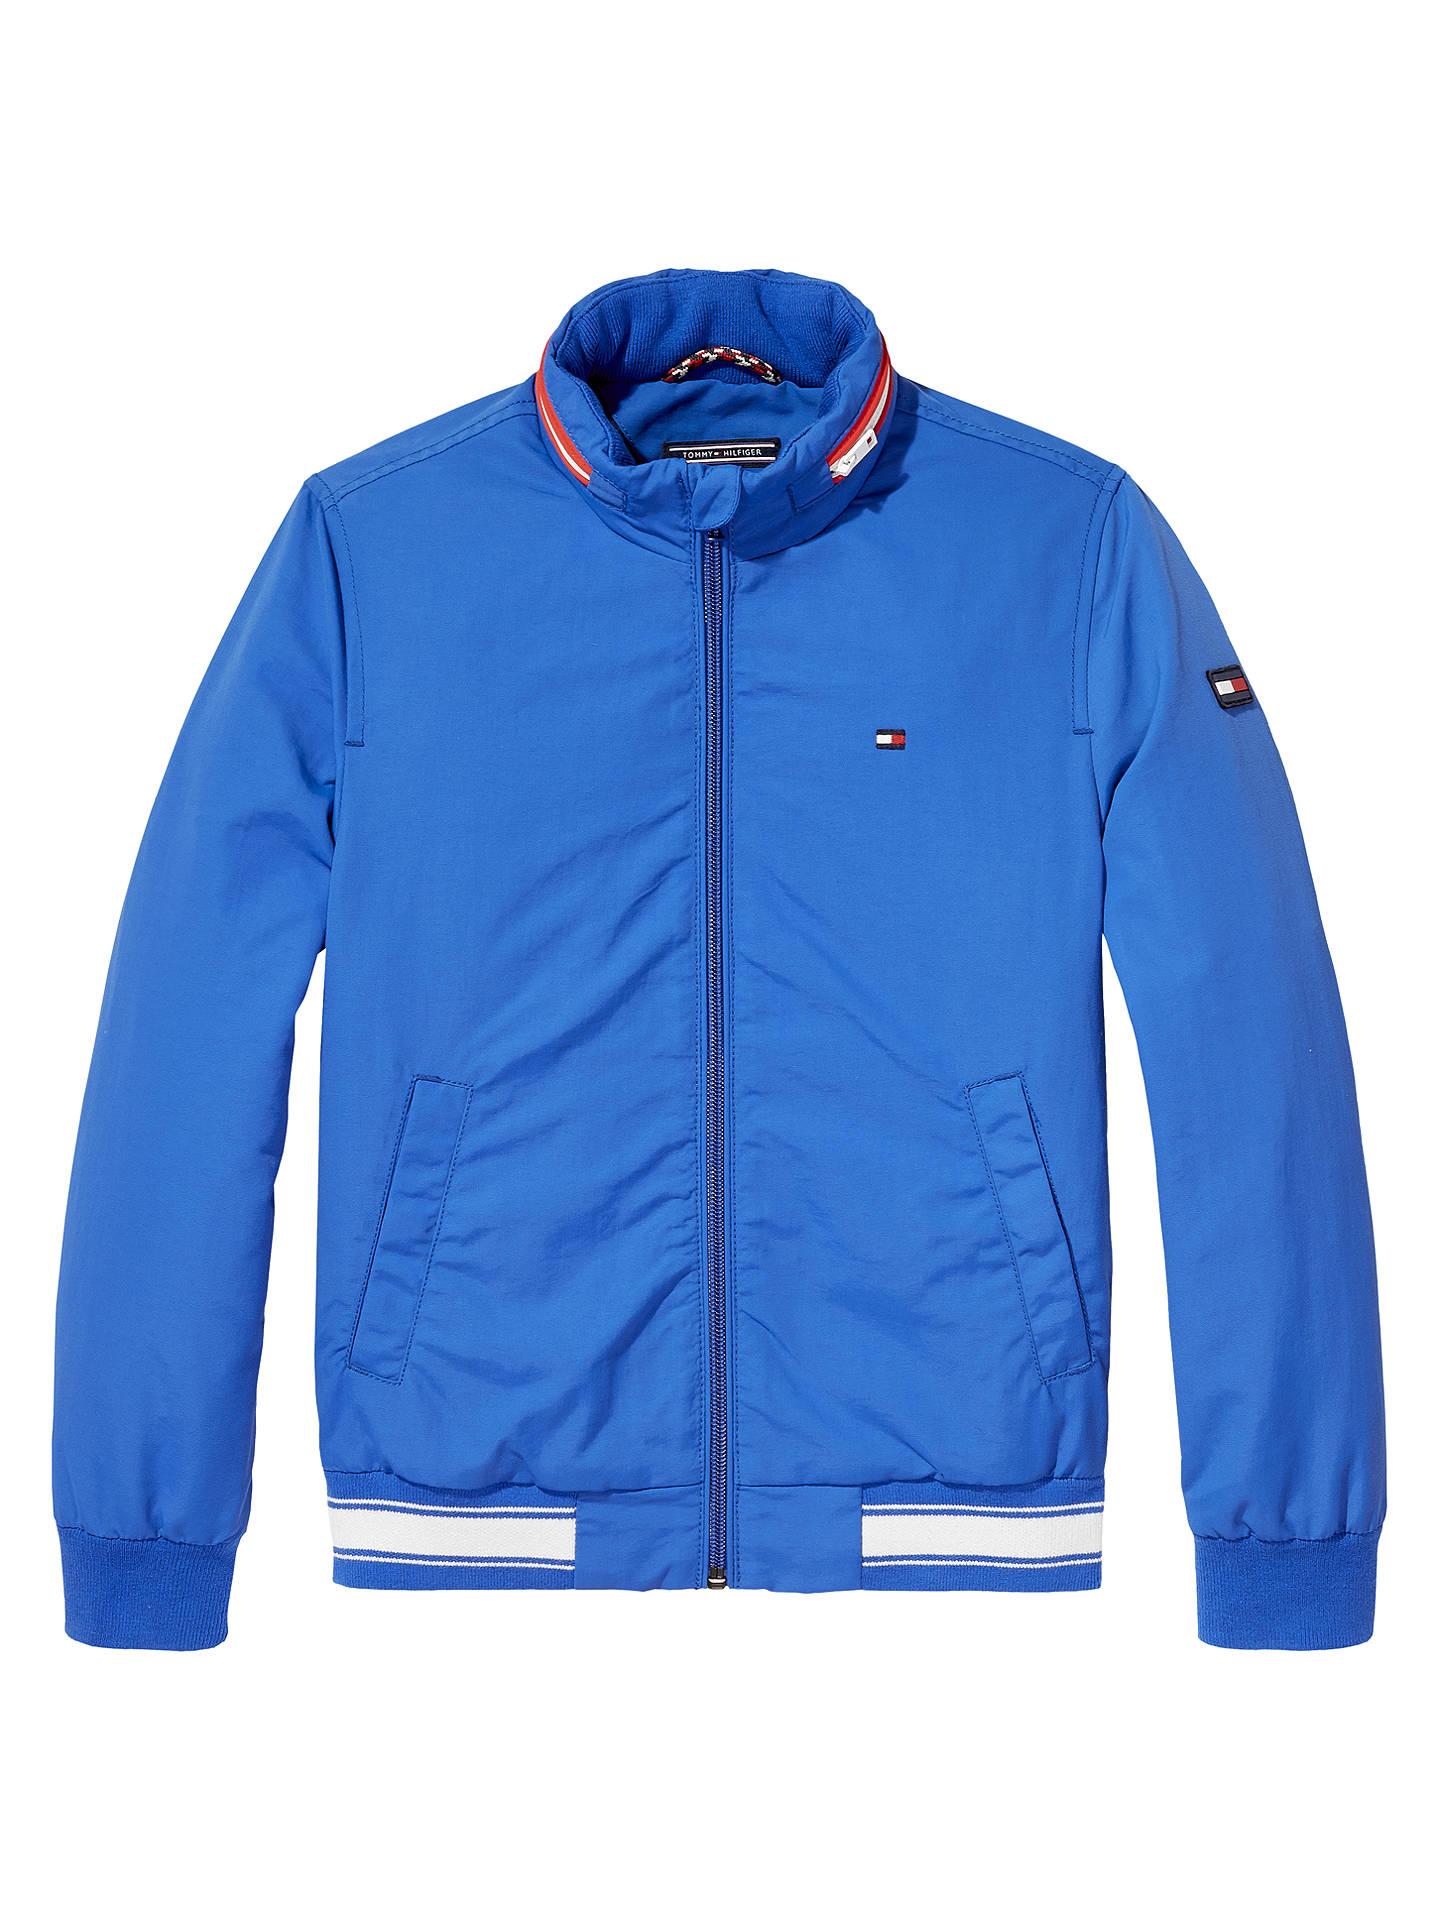 Tommy Hilfiger Boys' Ame Perky Bomber Jacket, Blue at John